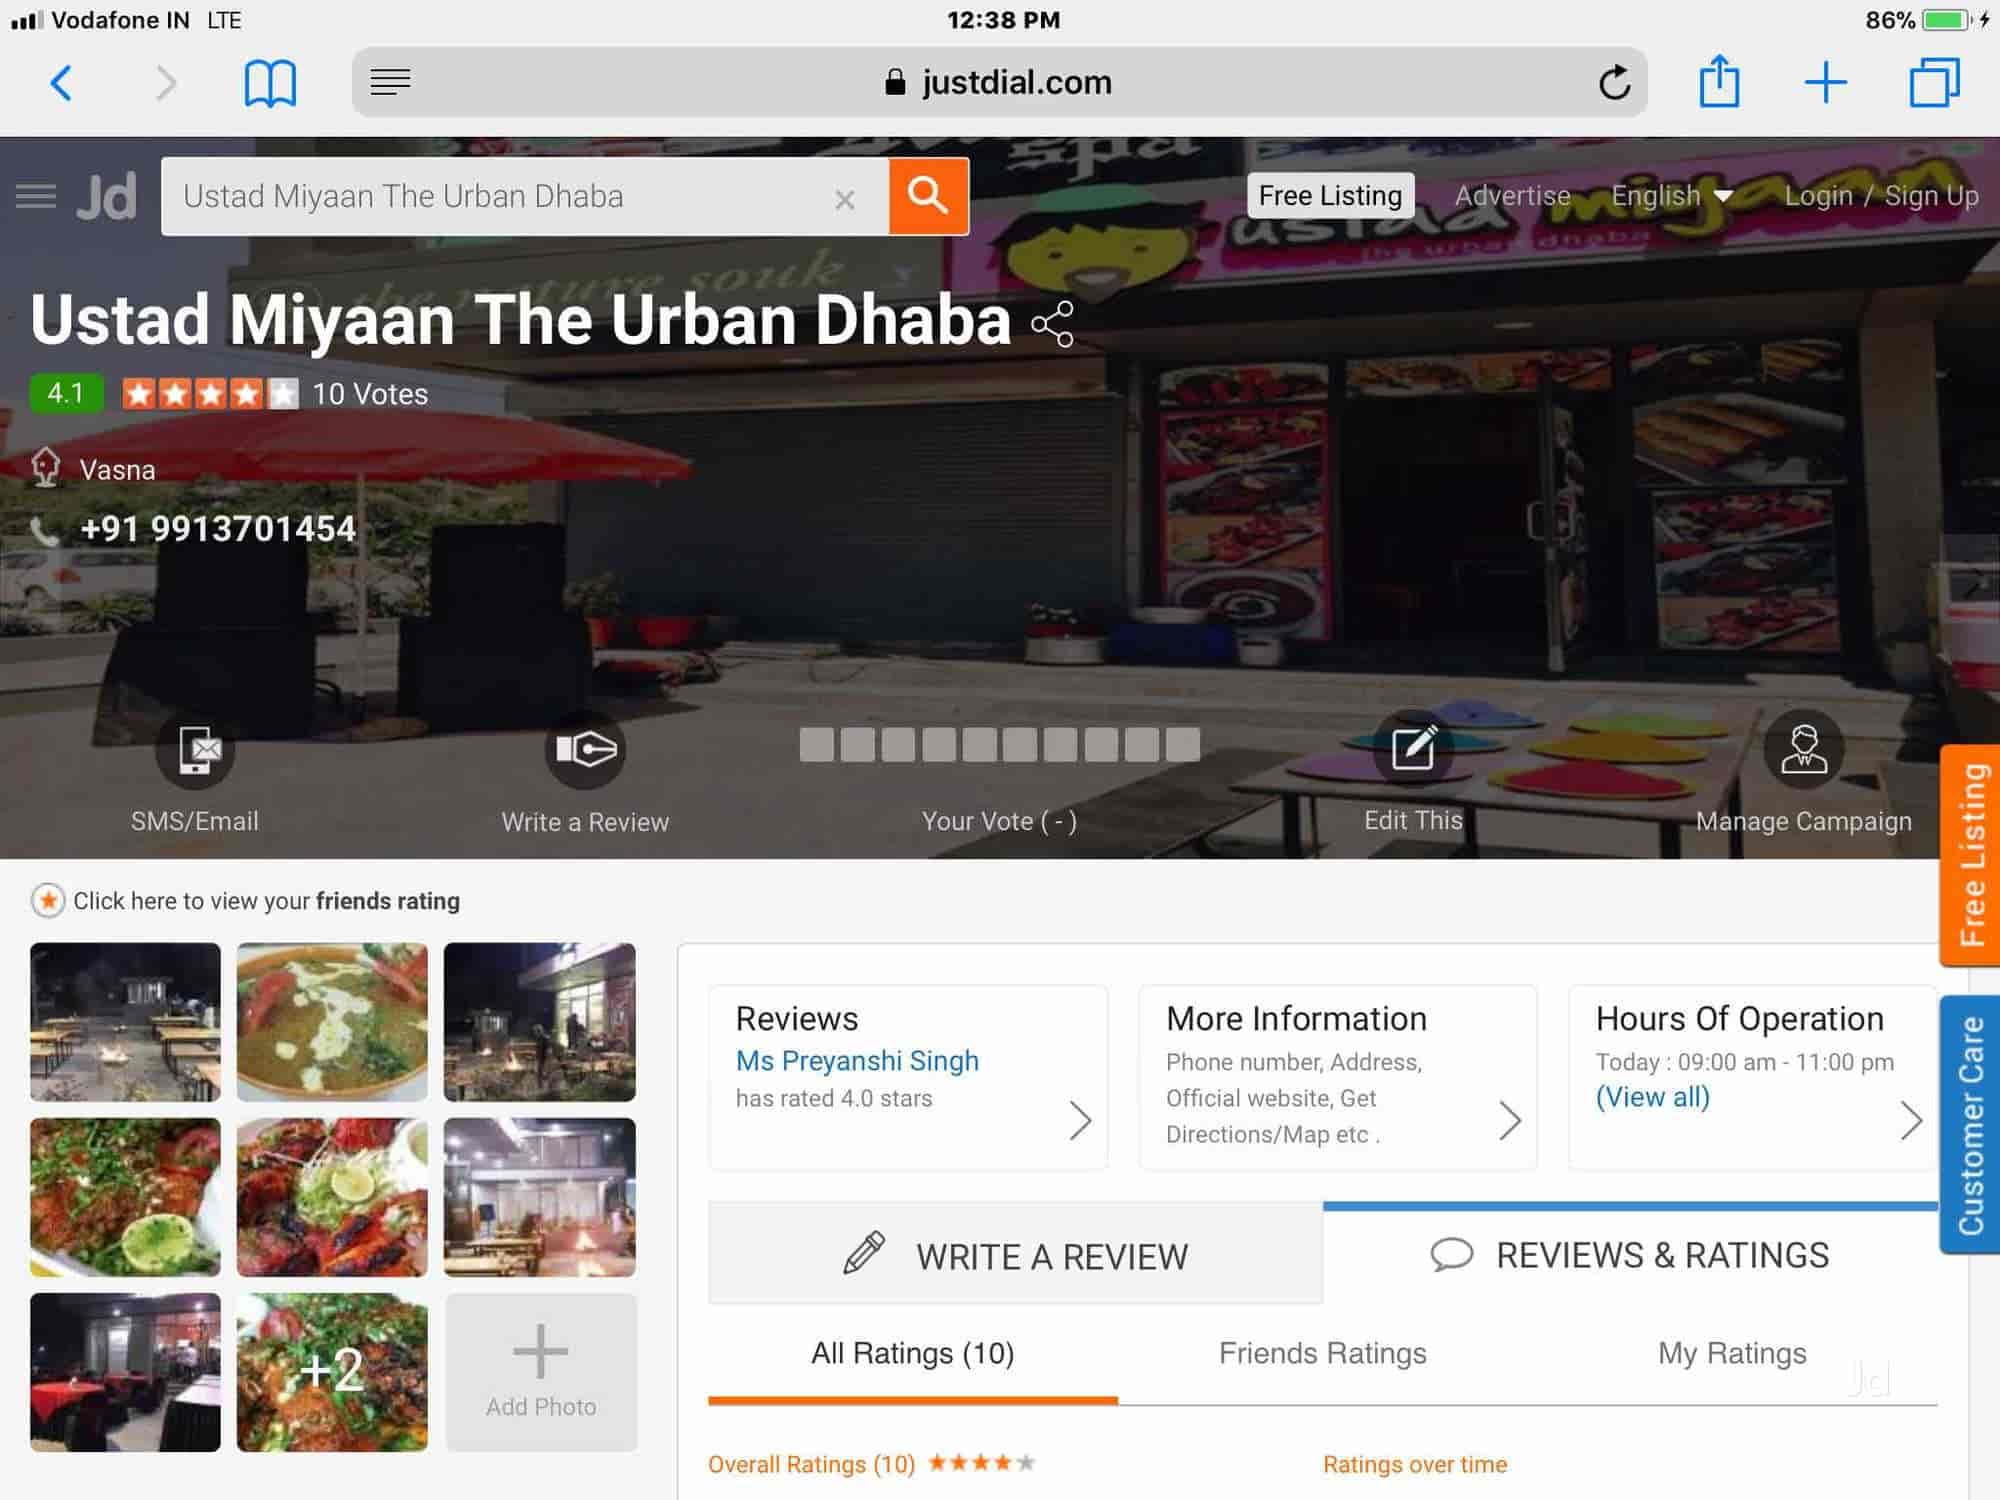 Audio Vision, Alkapuri - Electronic Goods Showrooms in Vadodara